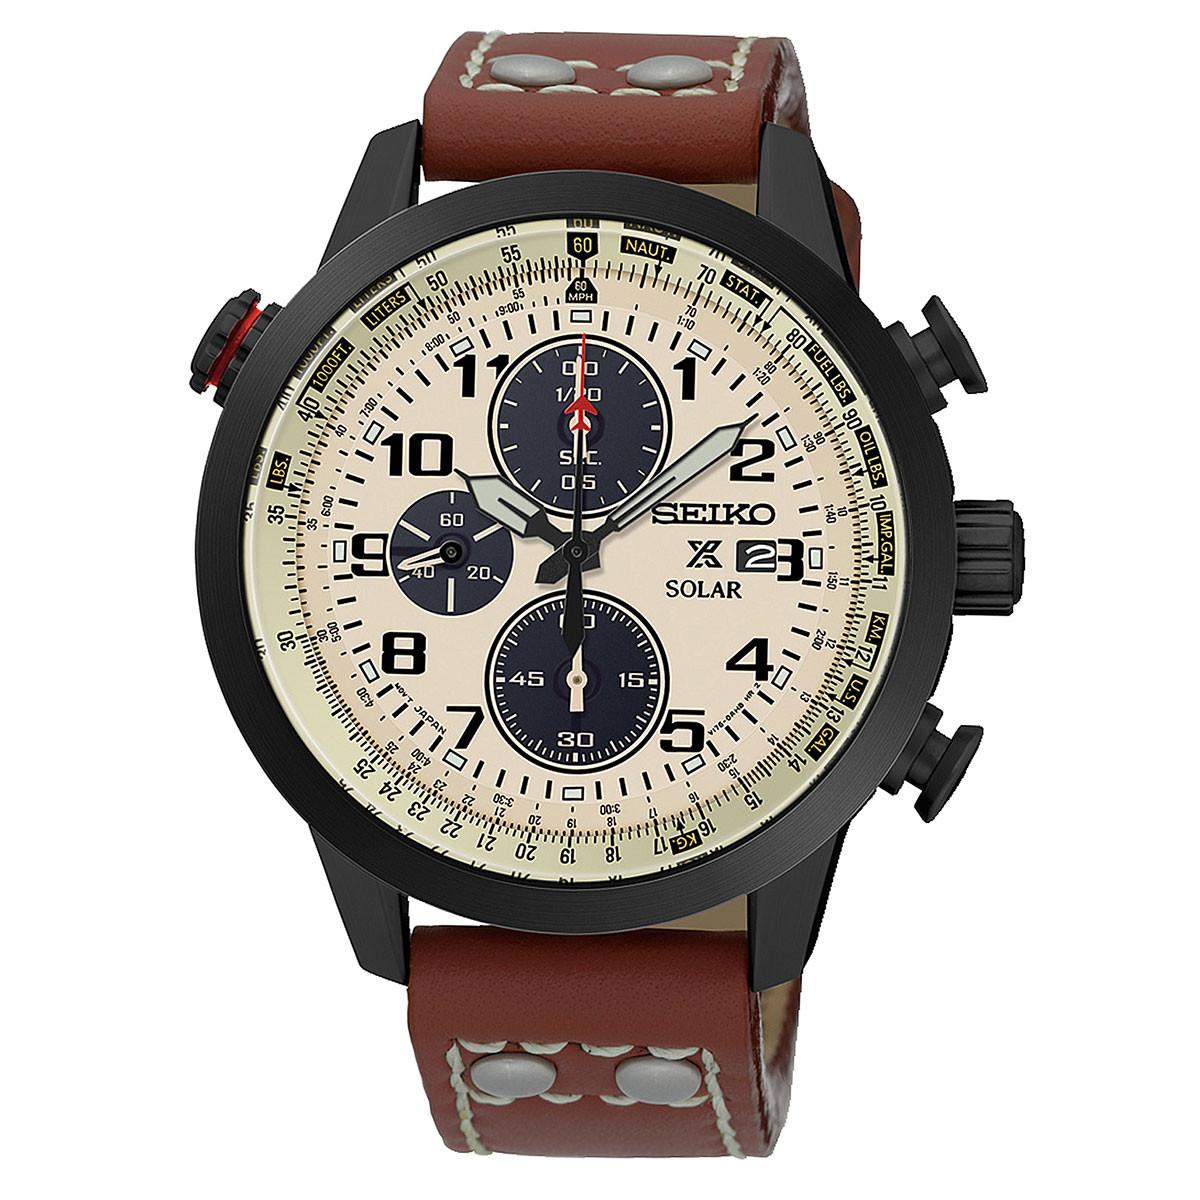 Часы Seiko Prospex SSC425P1 хронограф SOLAR